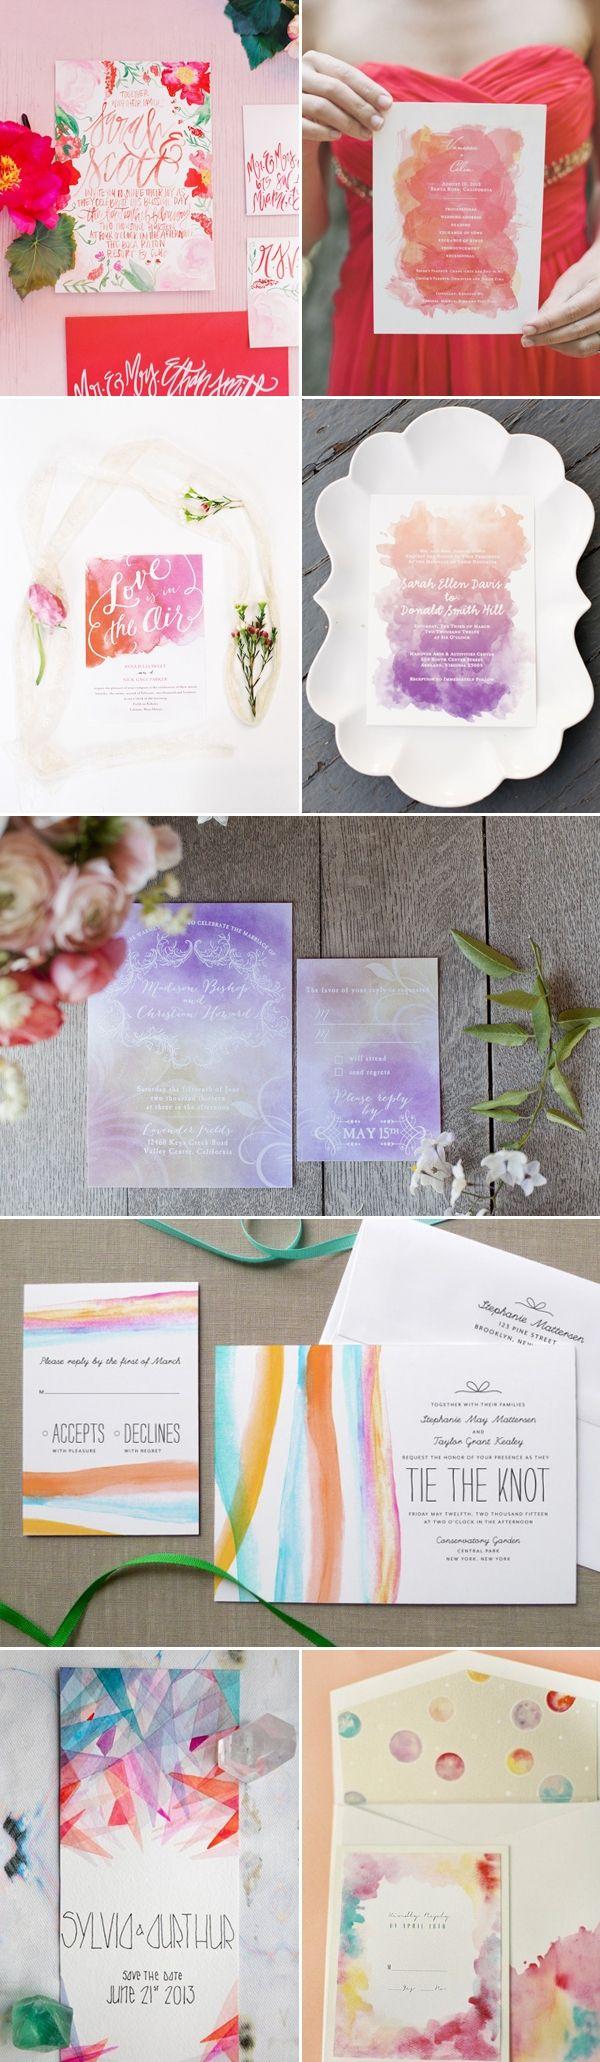 29 Watercolor Wedding Invitation Ideas You Will Love via Deer Pearl Flowers